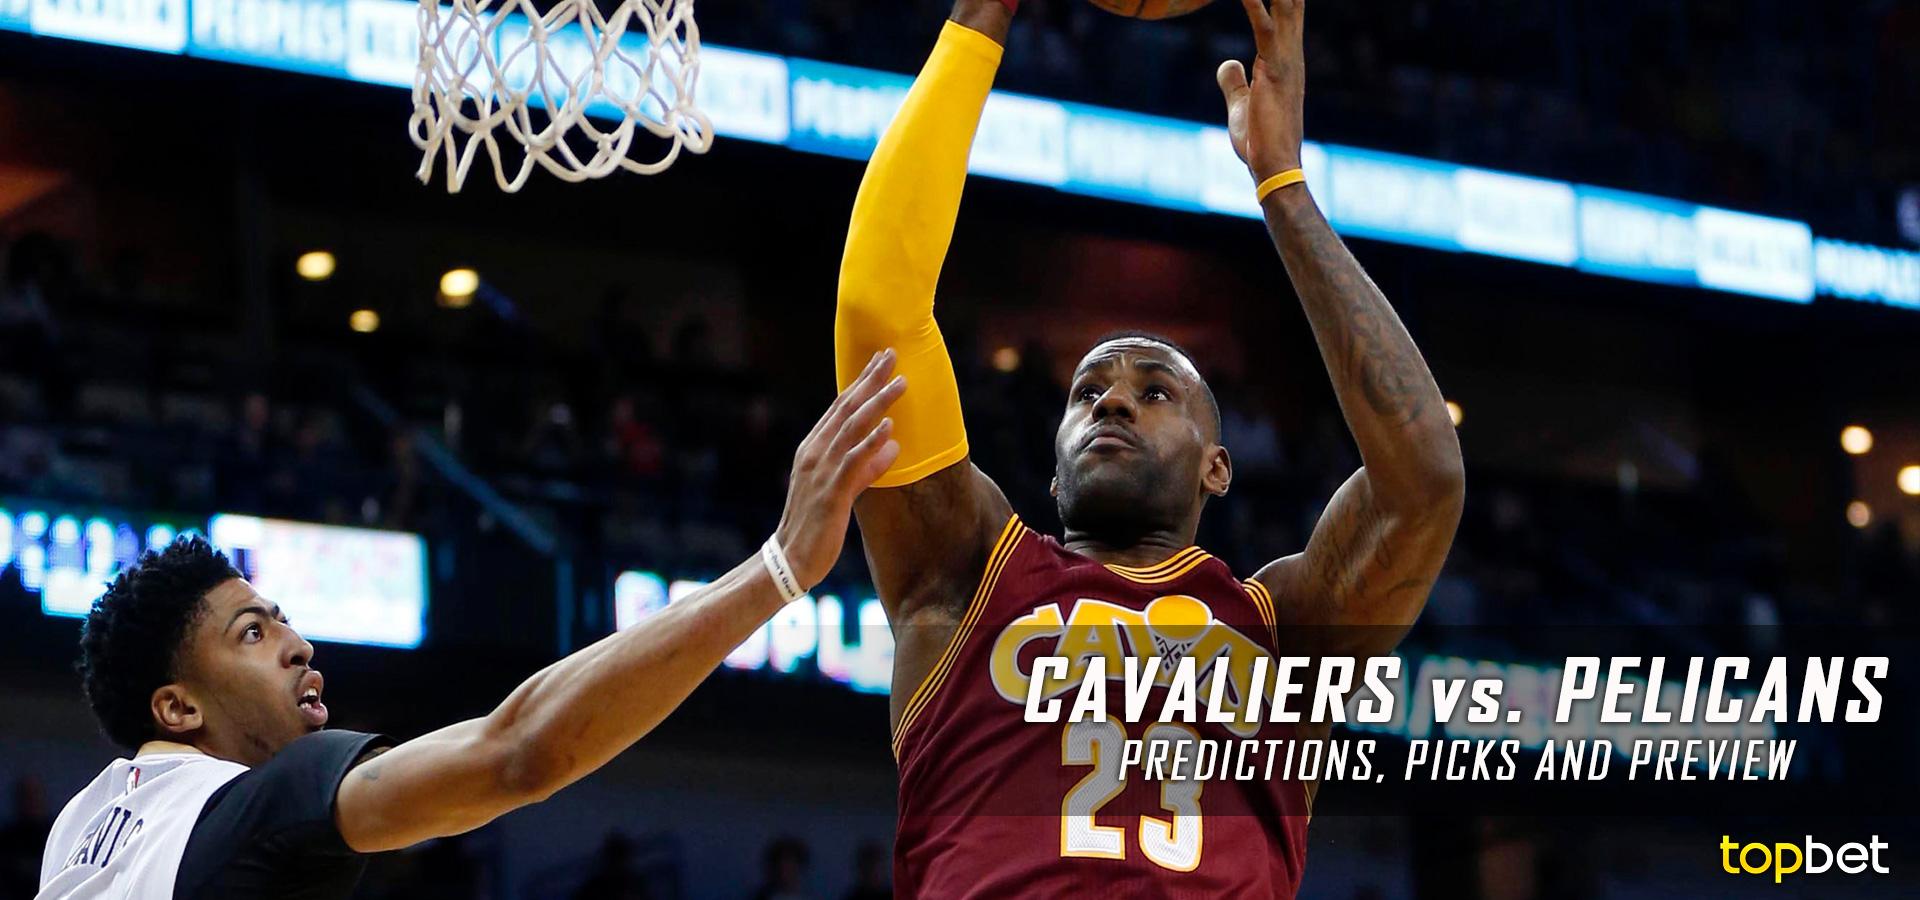 Cavs vs Pelicans Predictions, Picks & Preview – January 2017